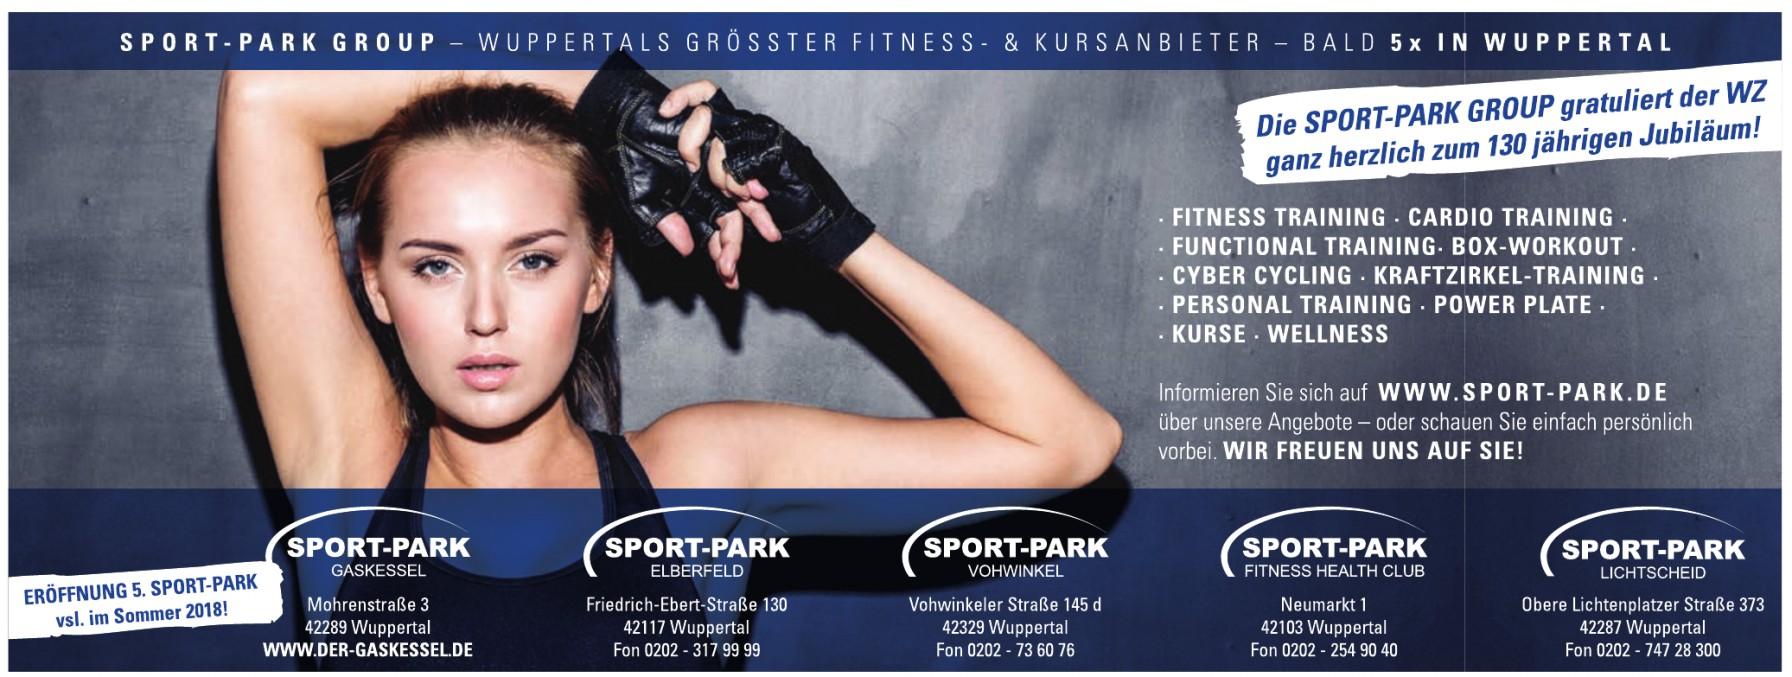 Sport-Park Group